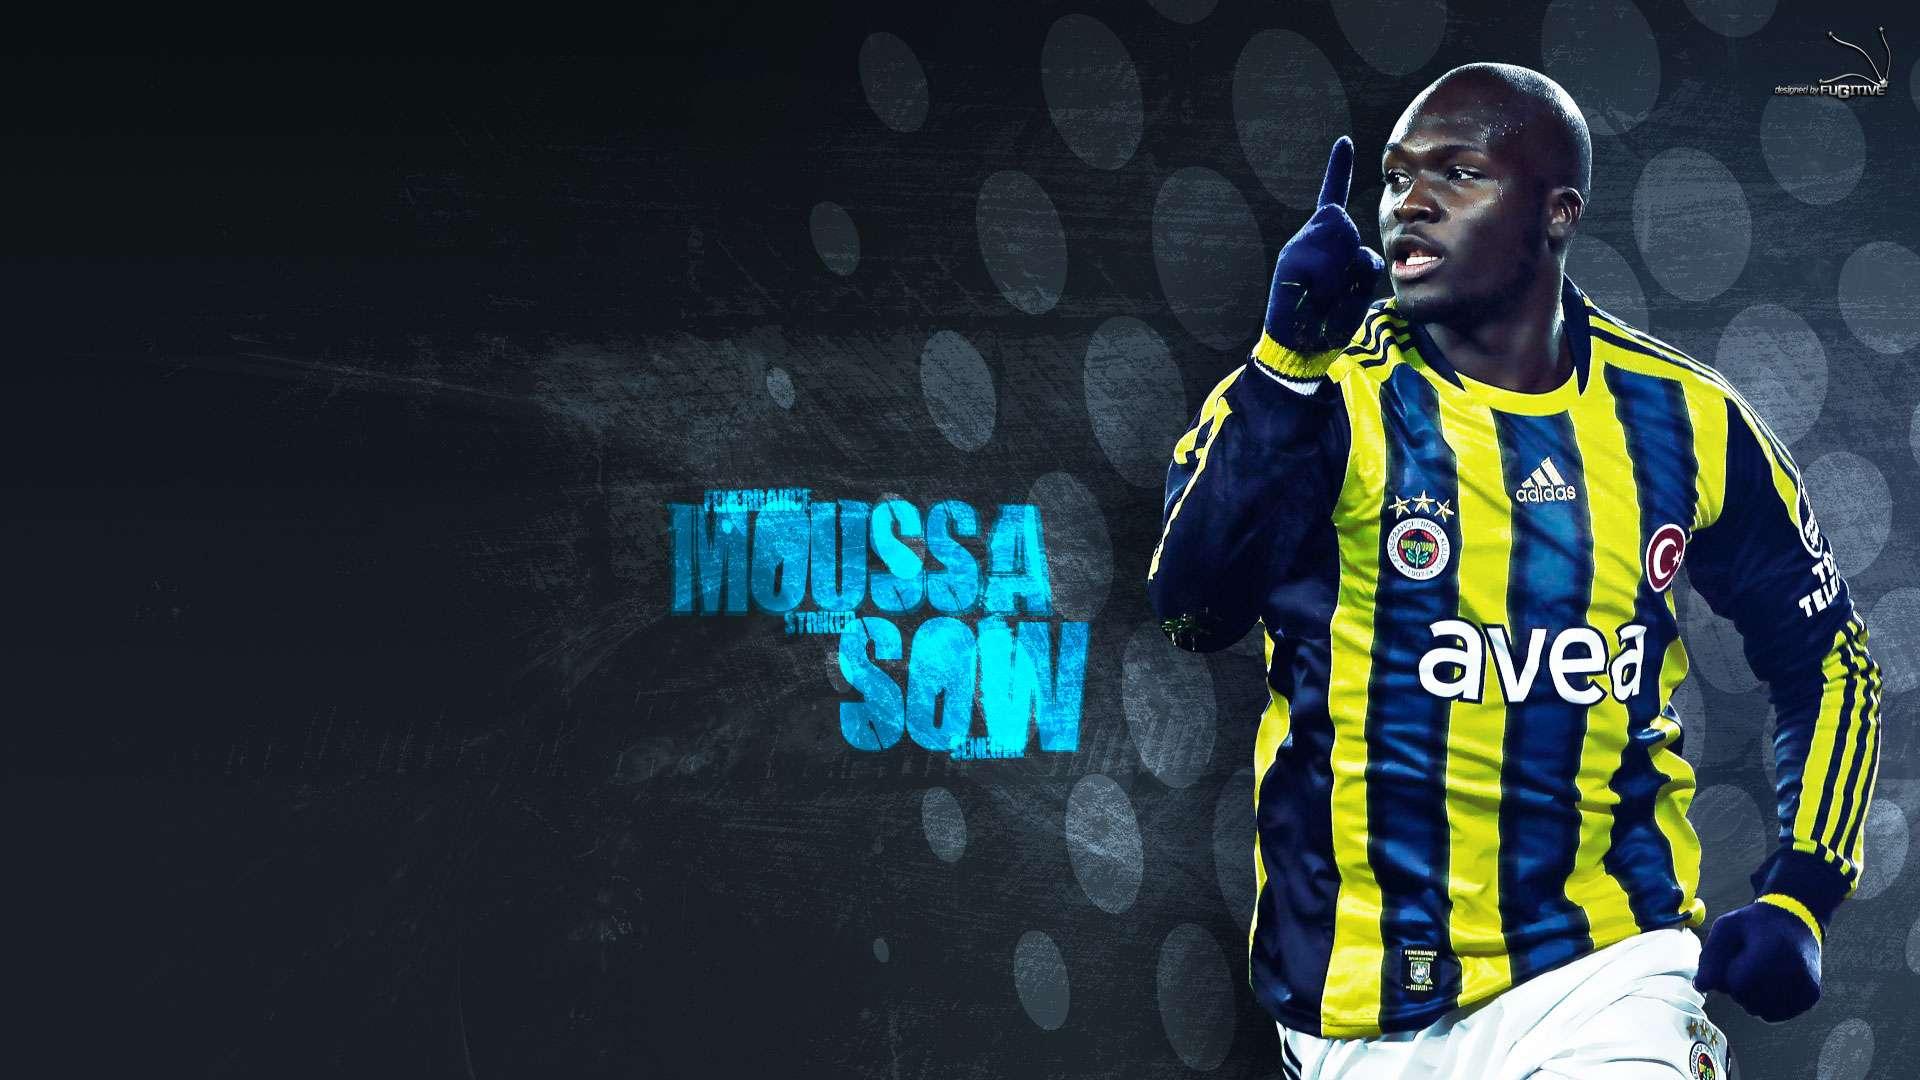 FB Fenerbahçe Futbol Takımı Wallpaper 32